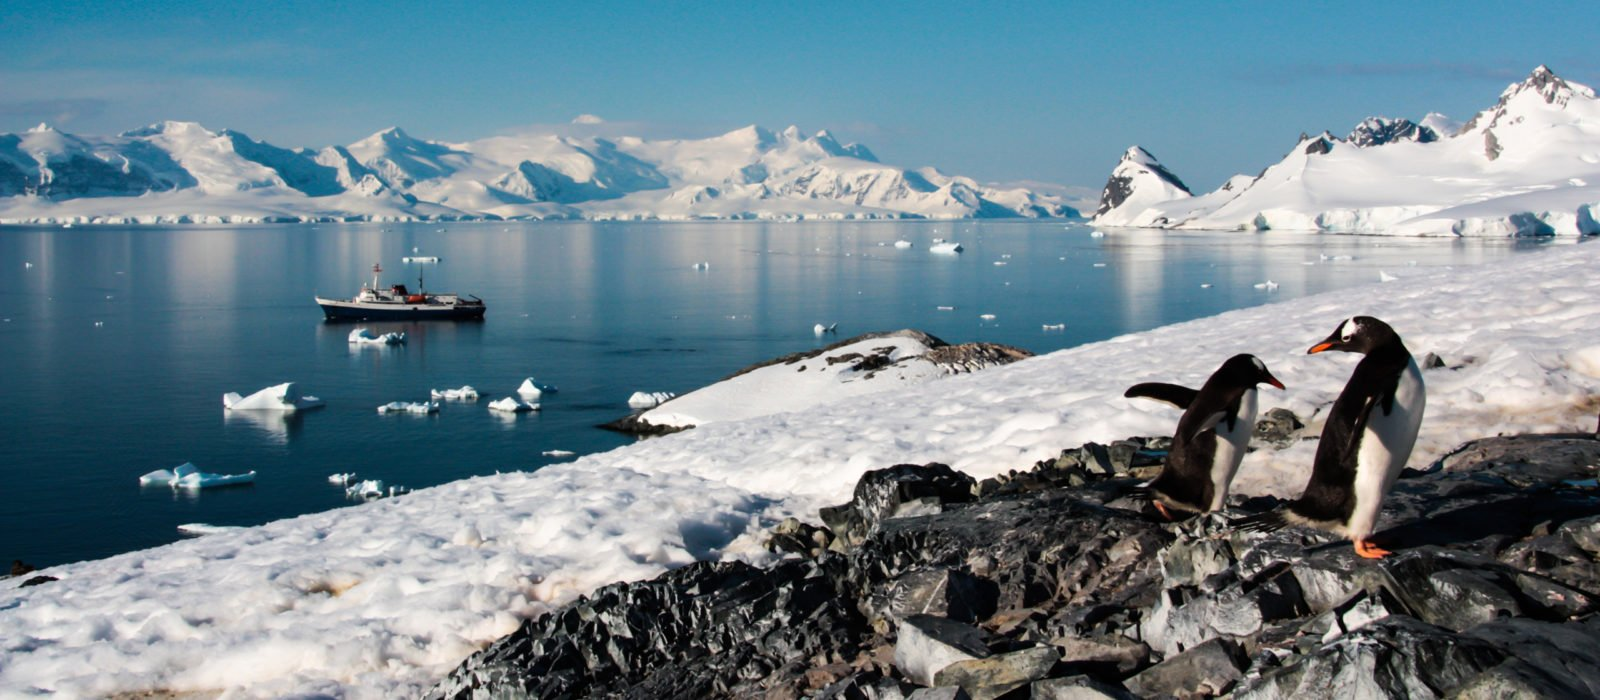 antarctica-view-penguins